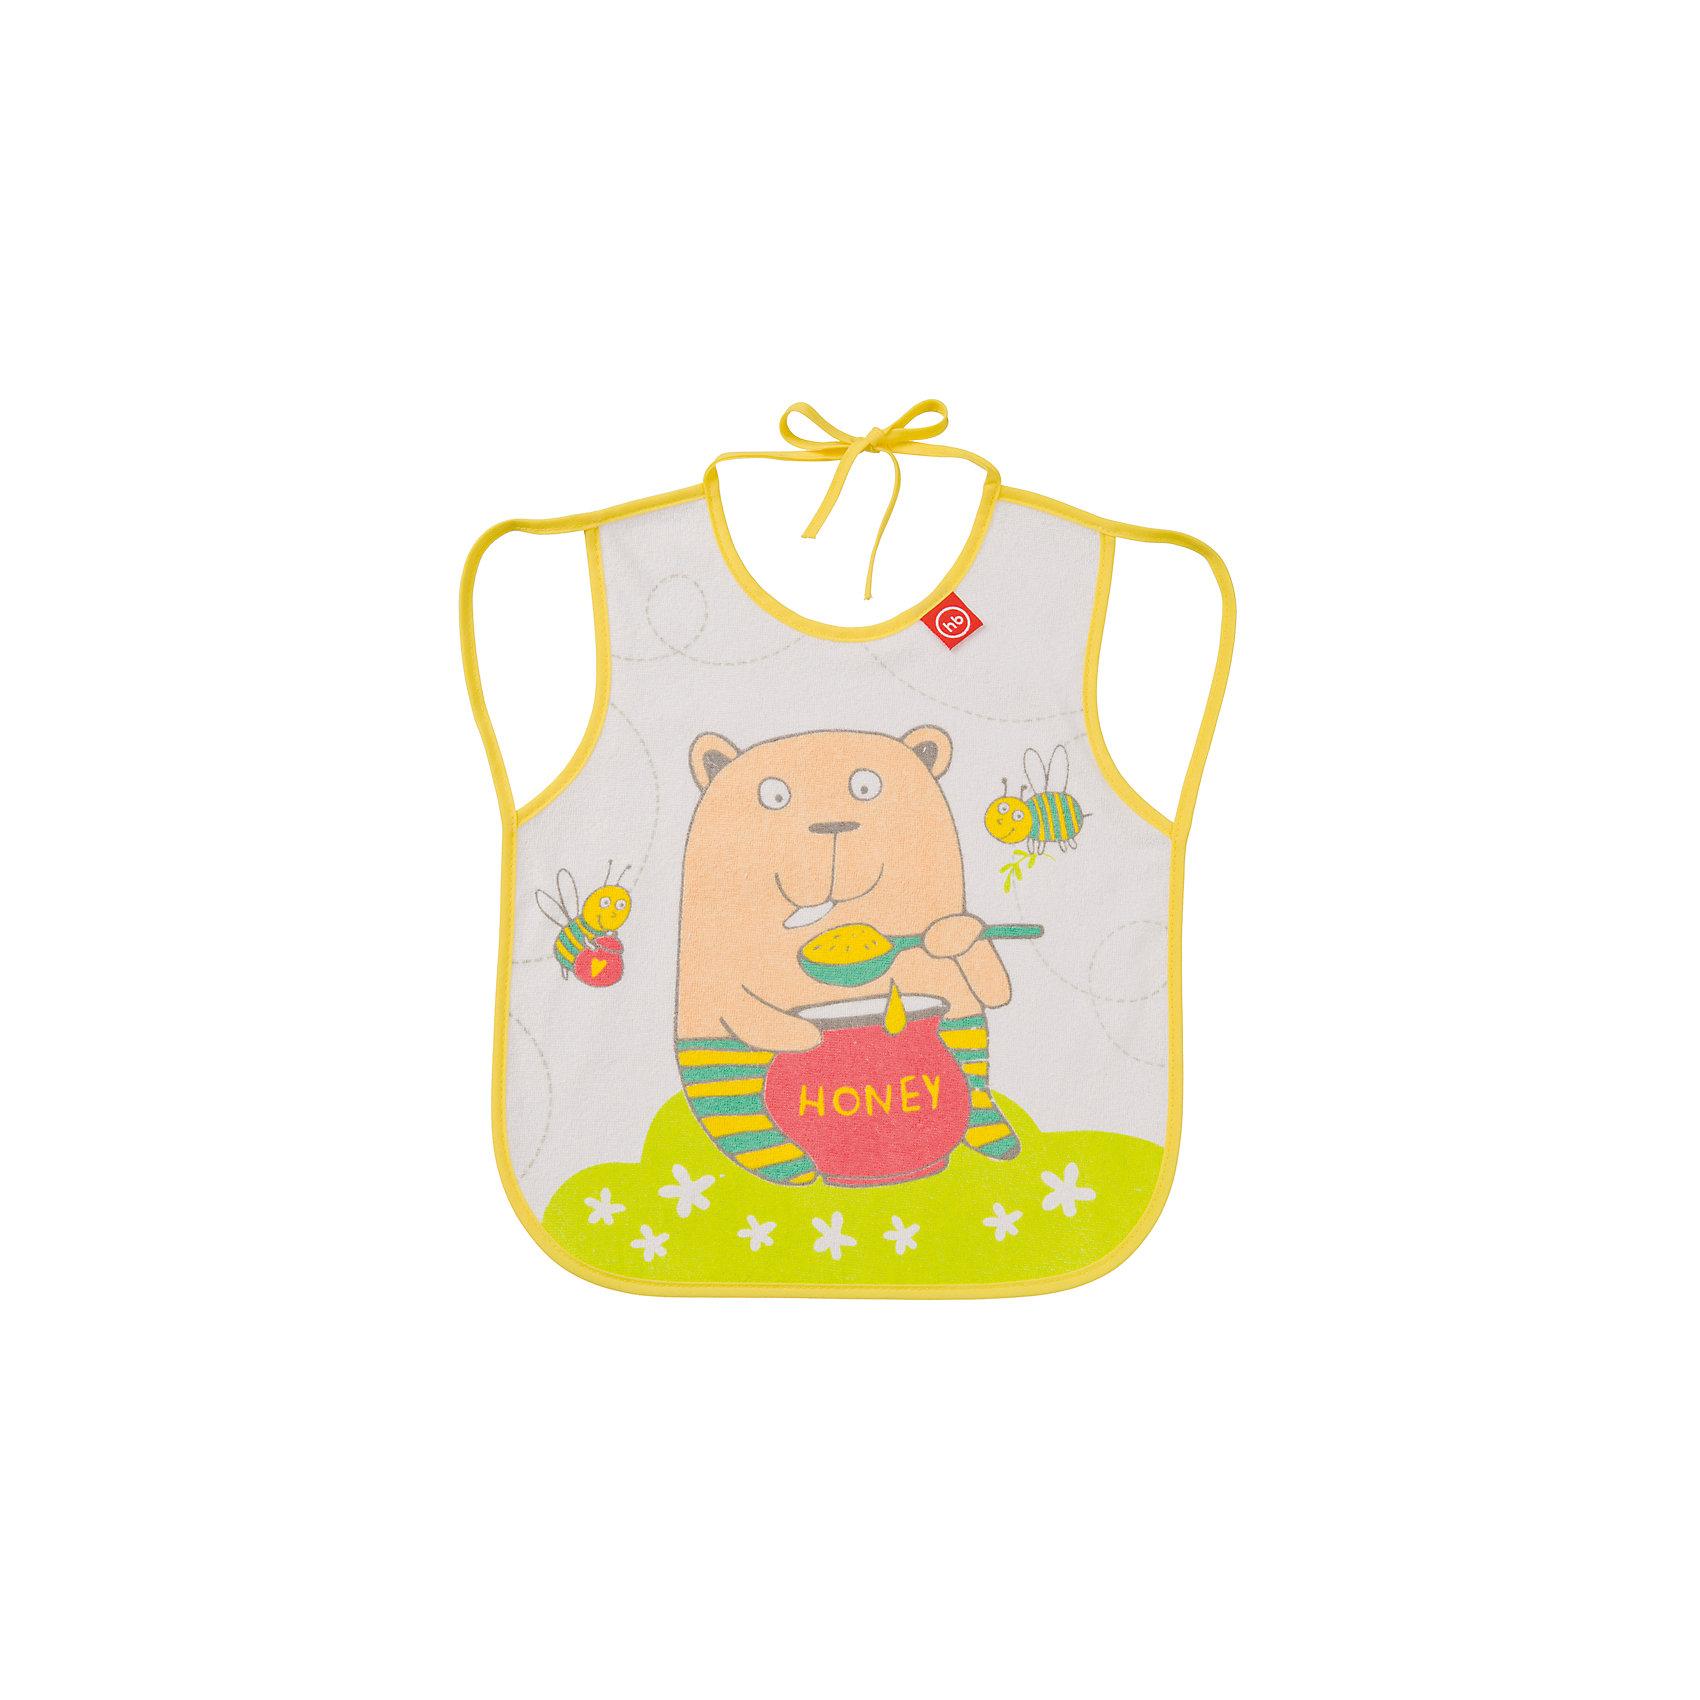 Happy Baby Фартук нагрудный, Happy Baby, желтый регулируемый нагрудный фартук с